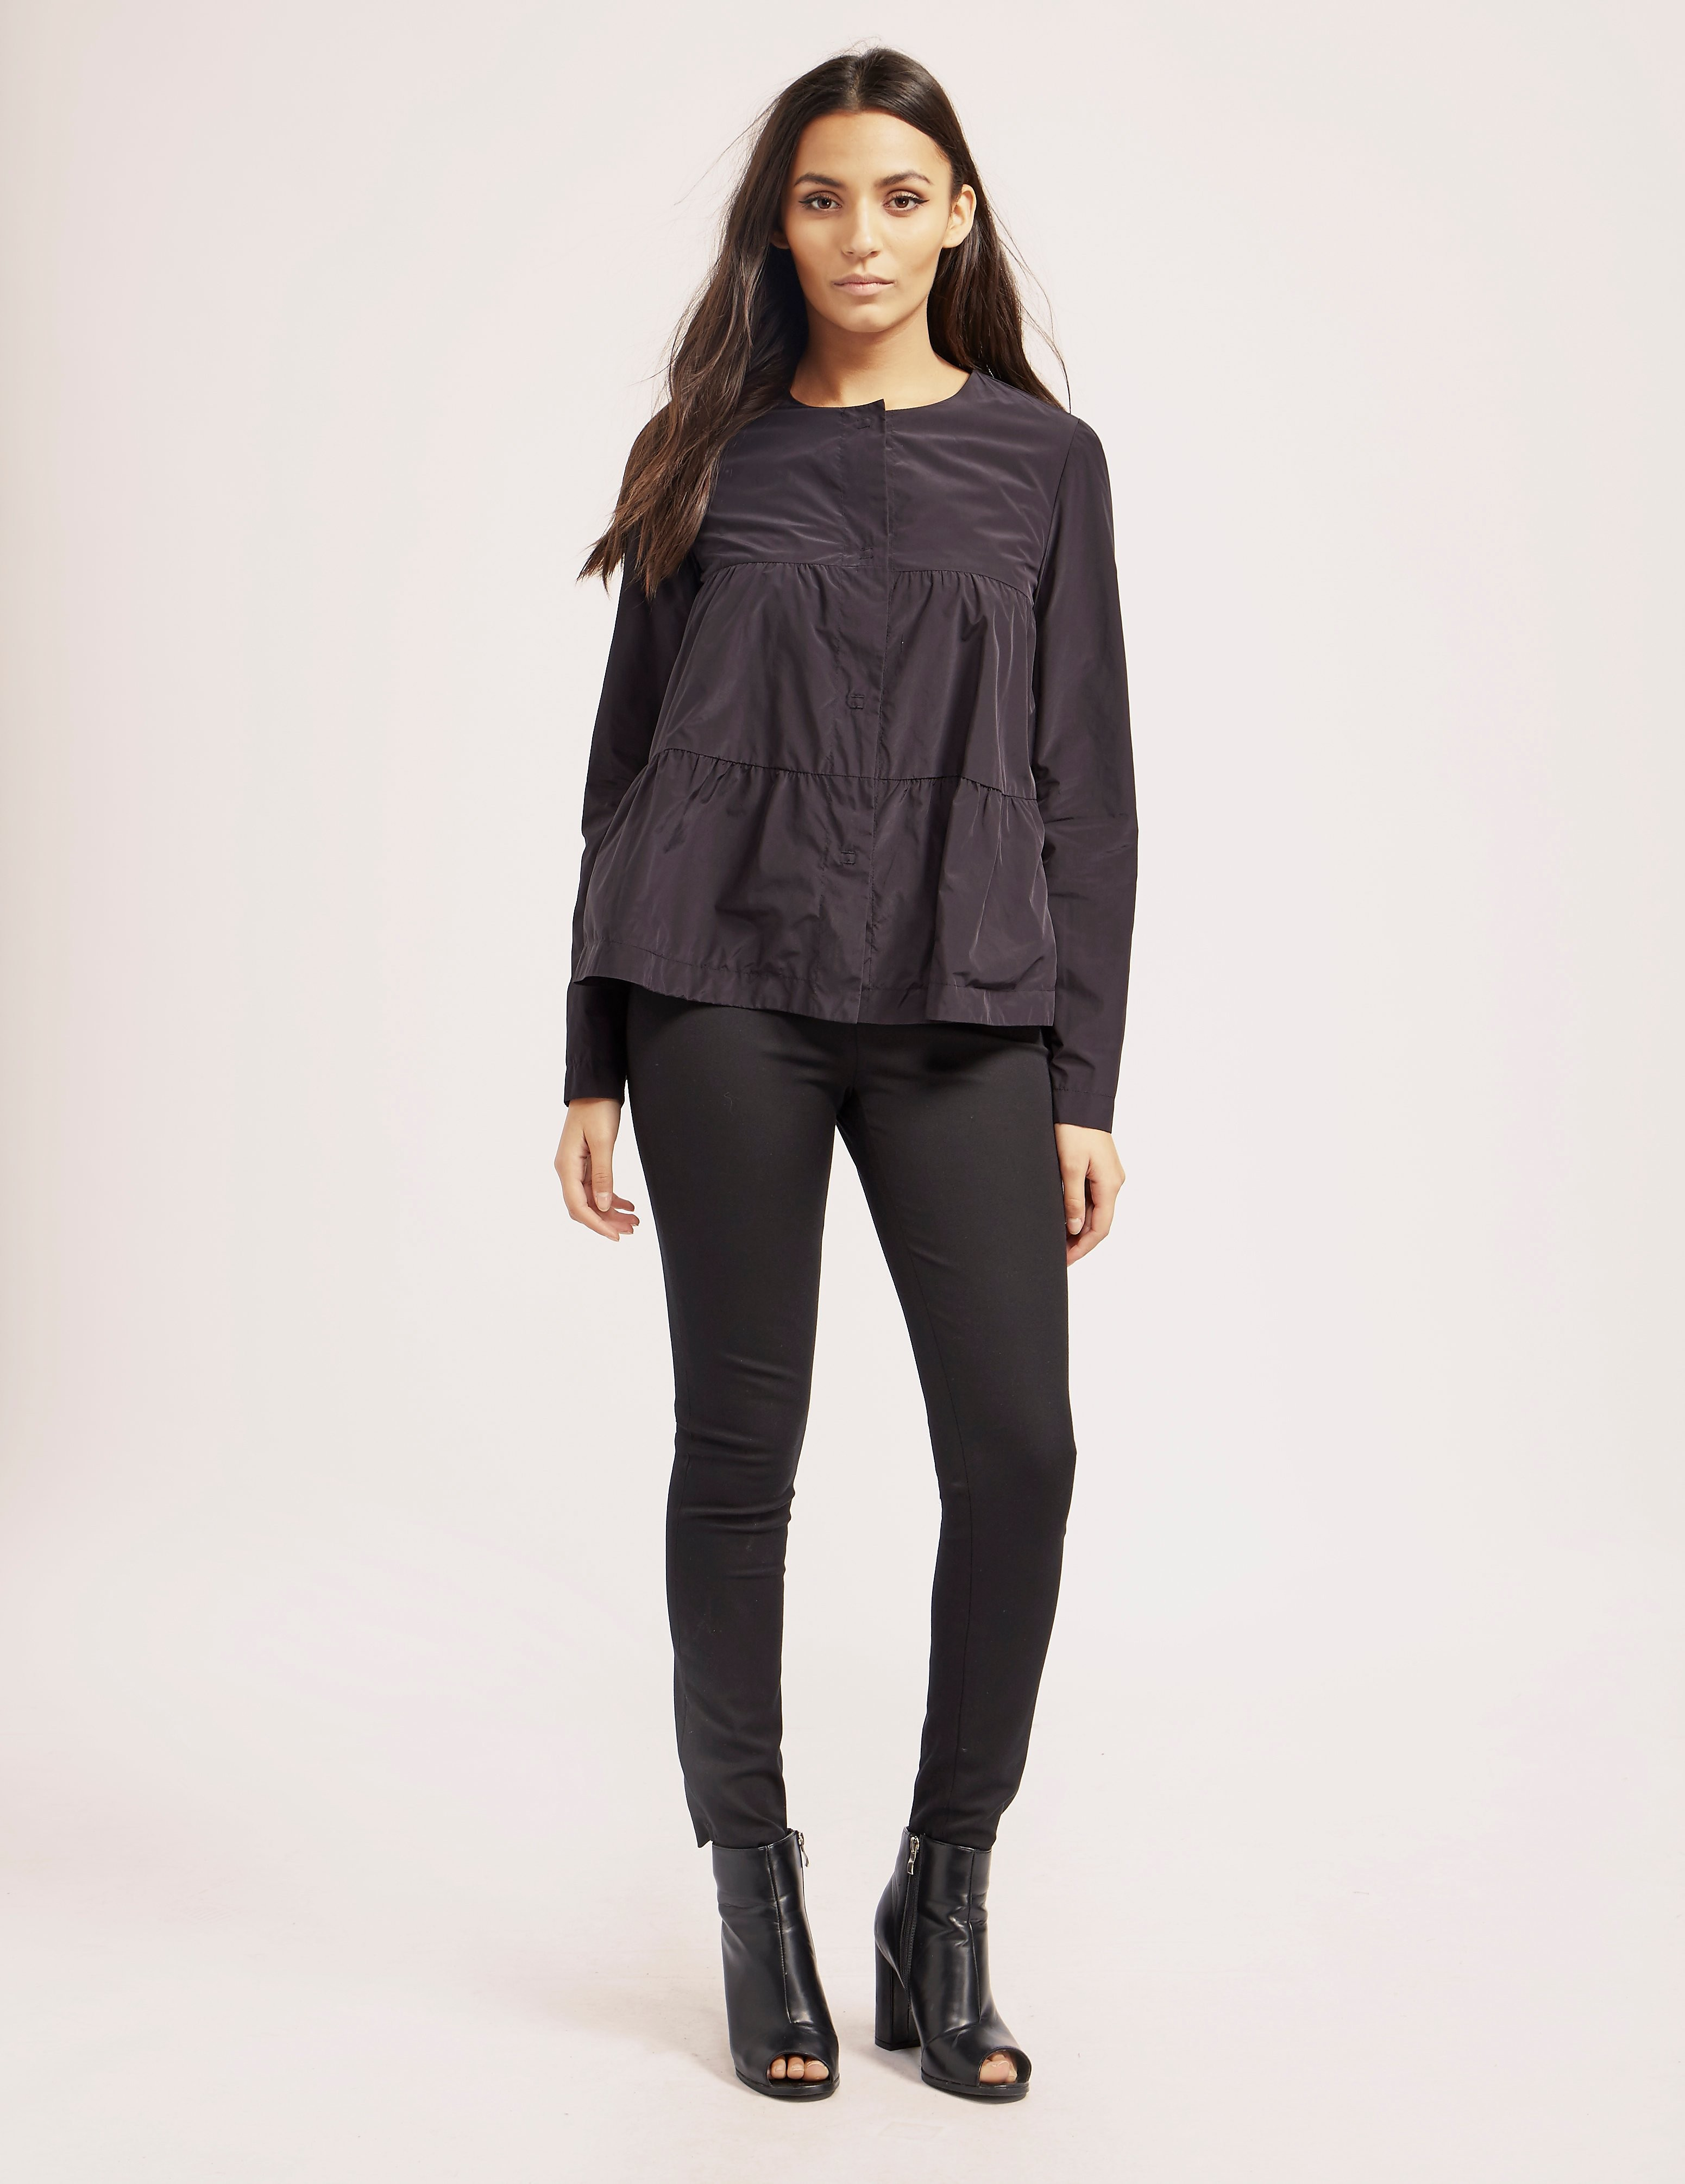 Armani Jeans Frill Jacket